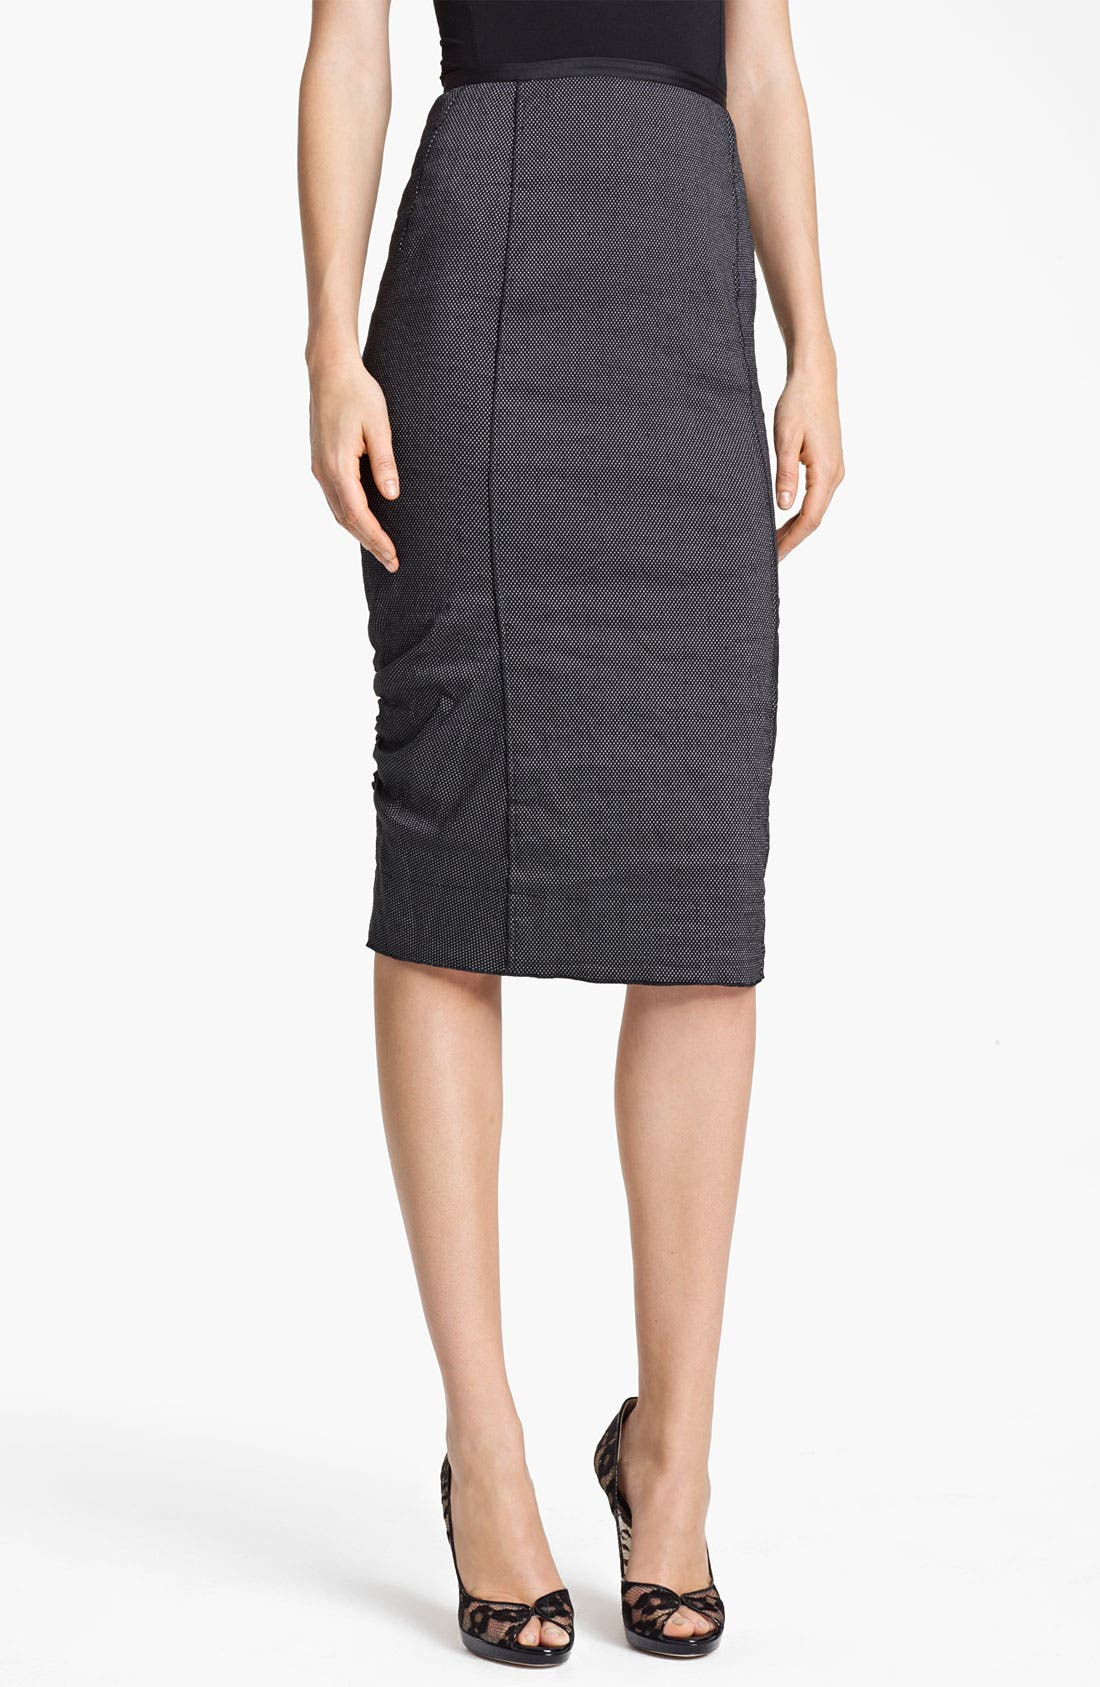 Alternate Image 1 Selected - Nina Ricci Pin Dot Pencil Skirt